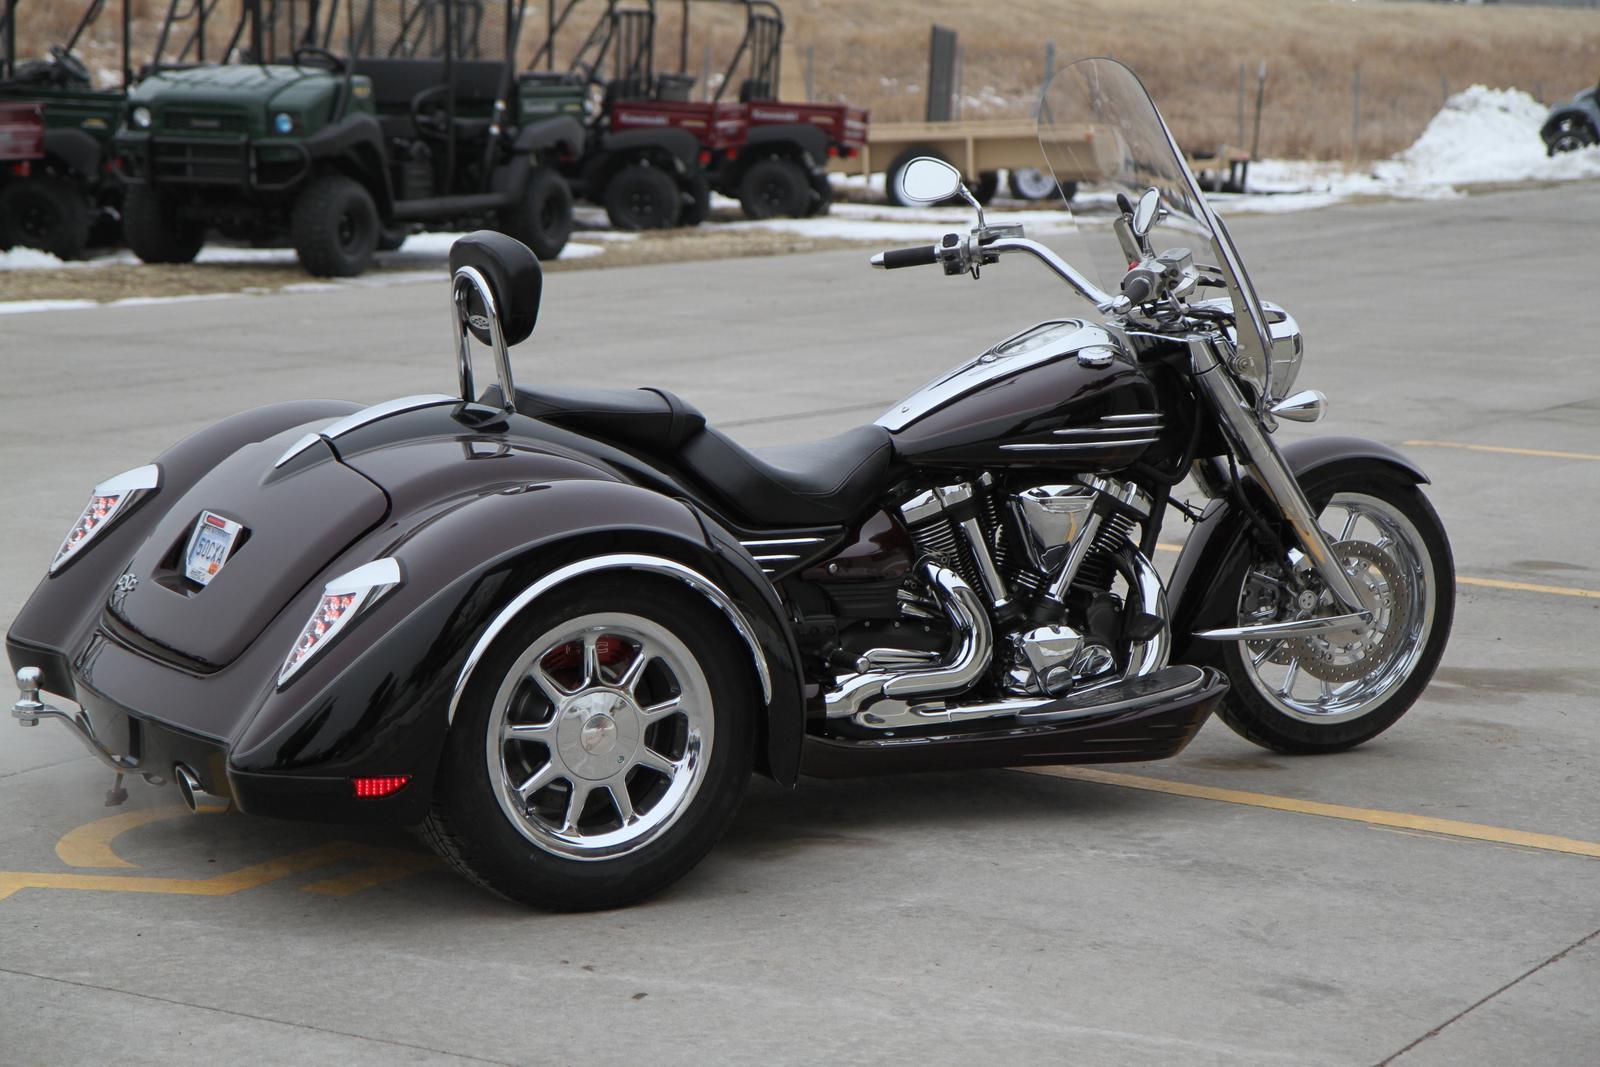 California Sidecar Trike Conversions for sale in Hesston, KS